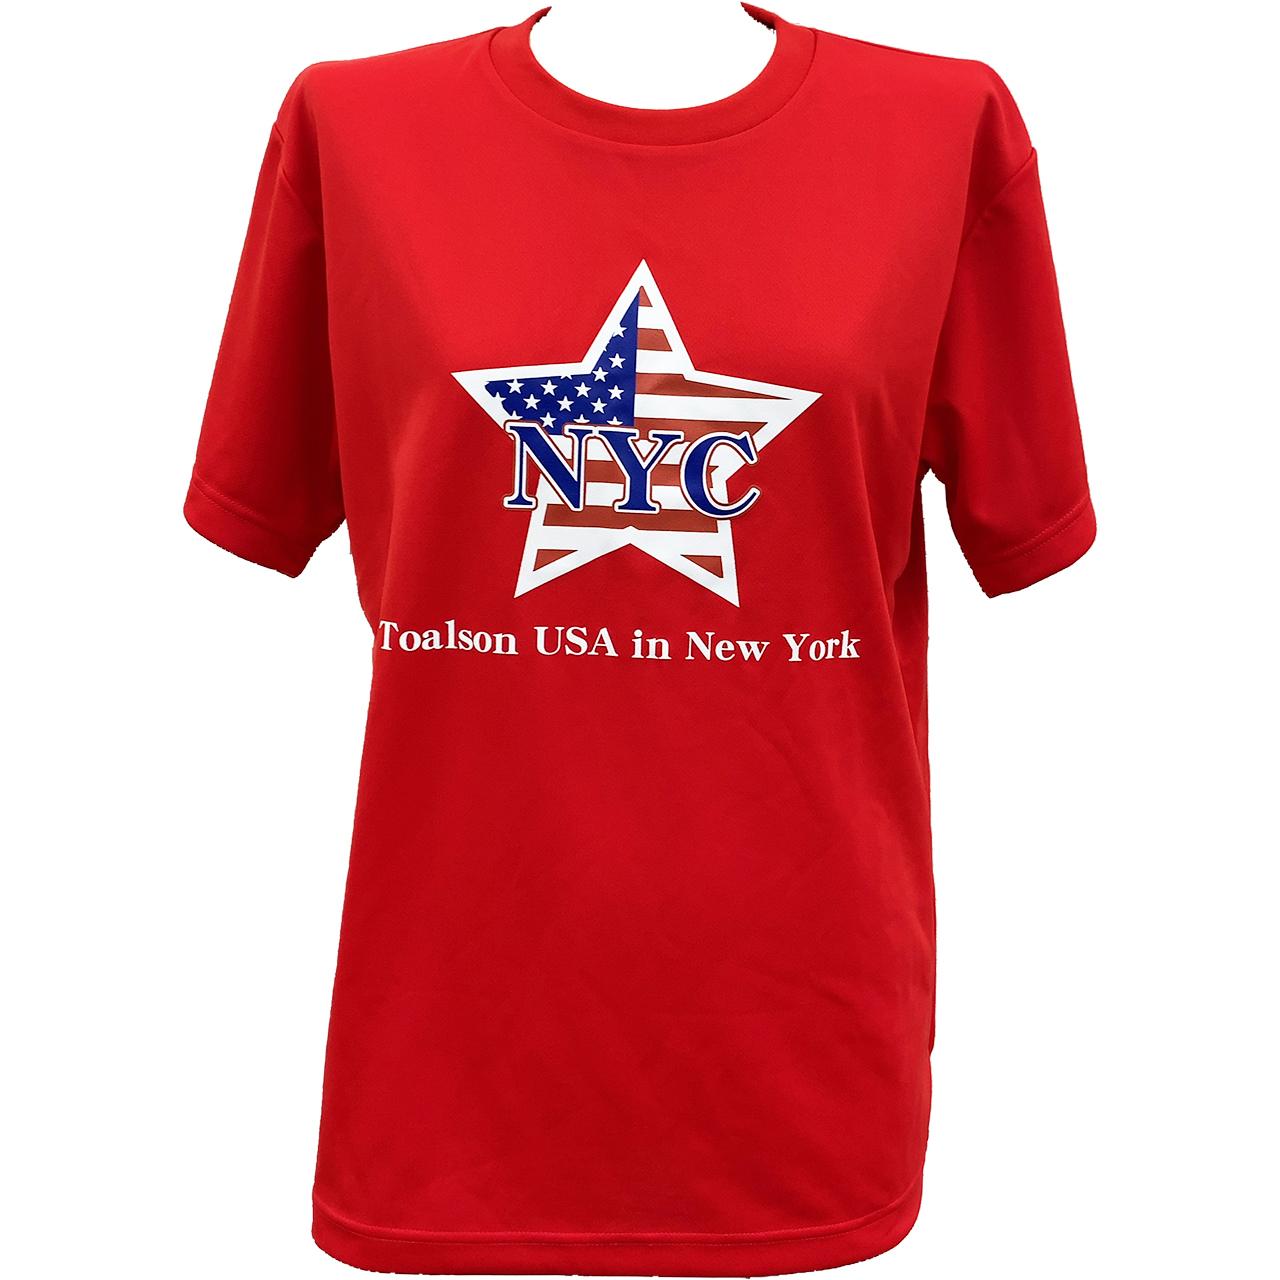 NYCTシャツ(レッド)【1ET1910】